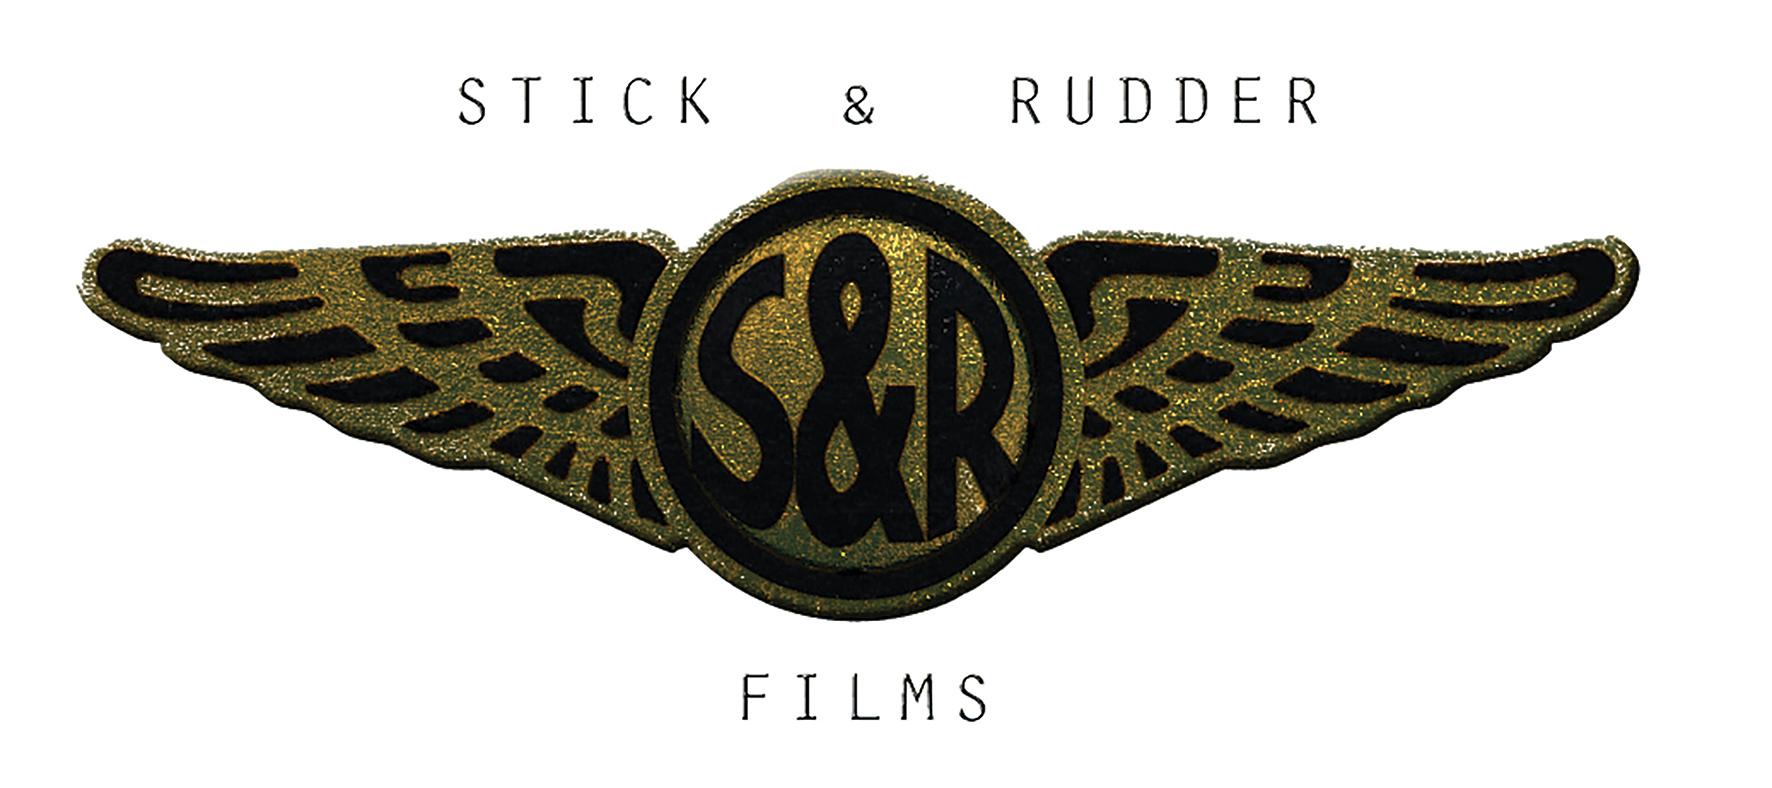 Stick & Rudder Films